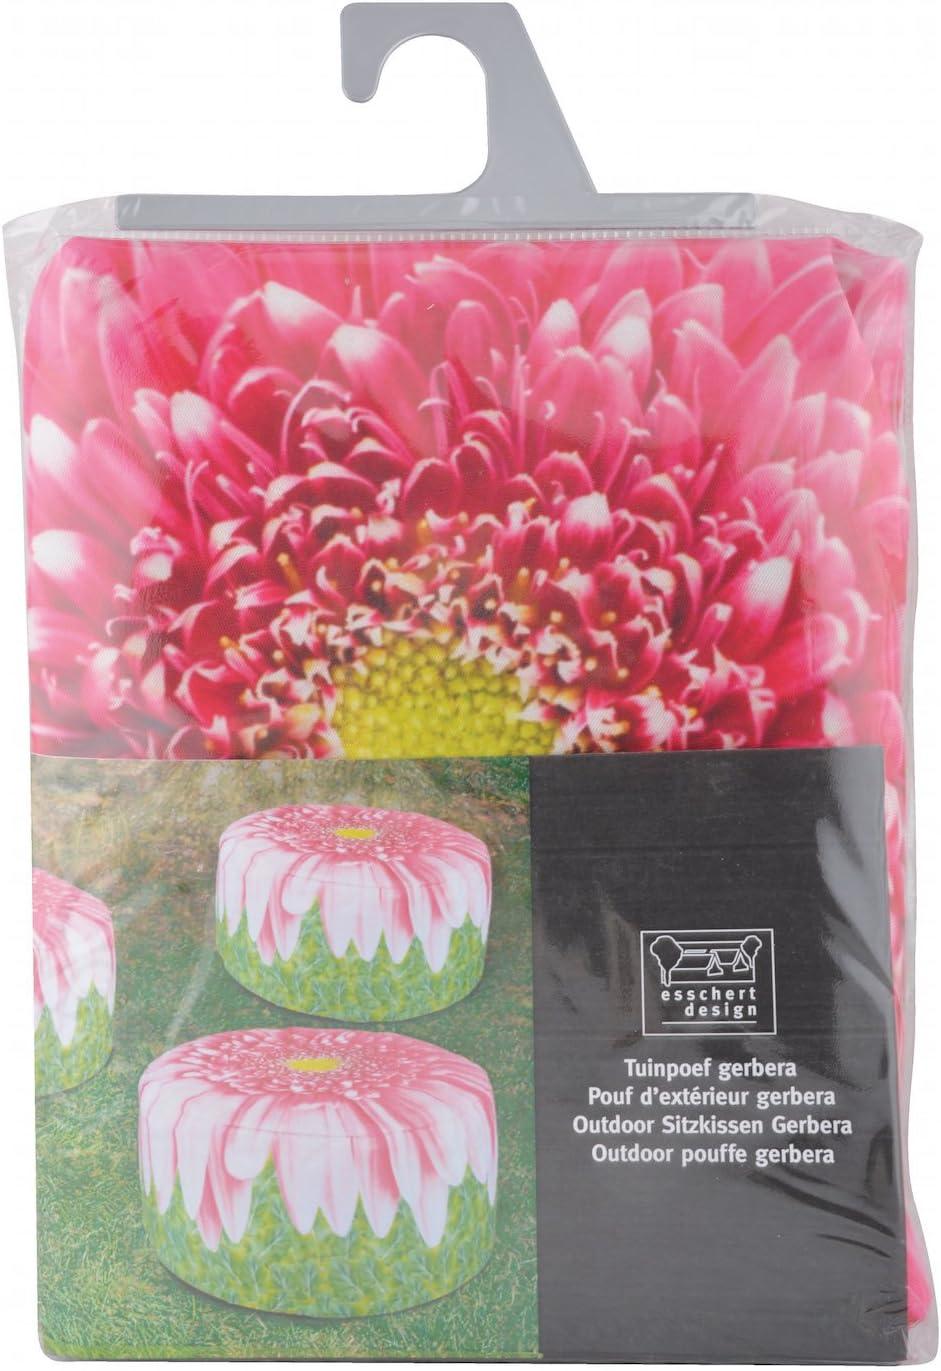 Sunflower Fun Flower Design Outdoor Pouffe Water Repellent Washable Garden Seat 58cm x 32.5cm